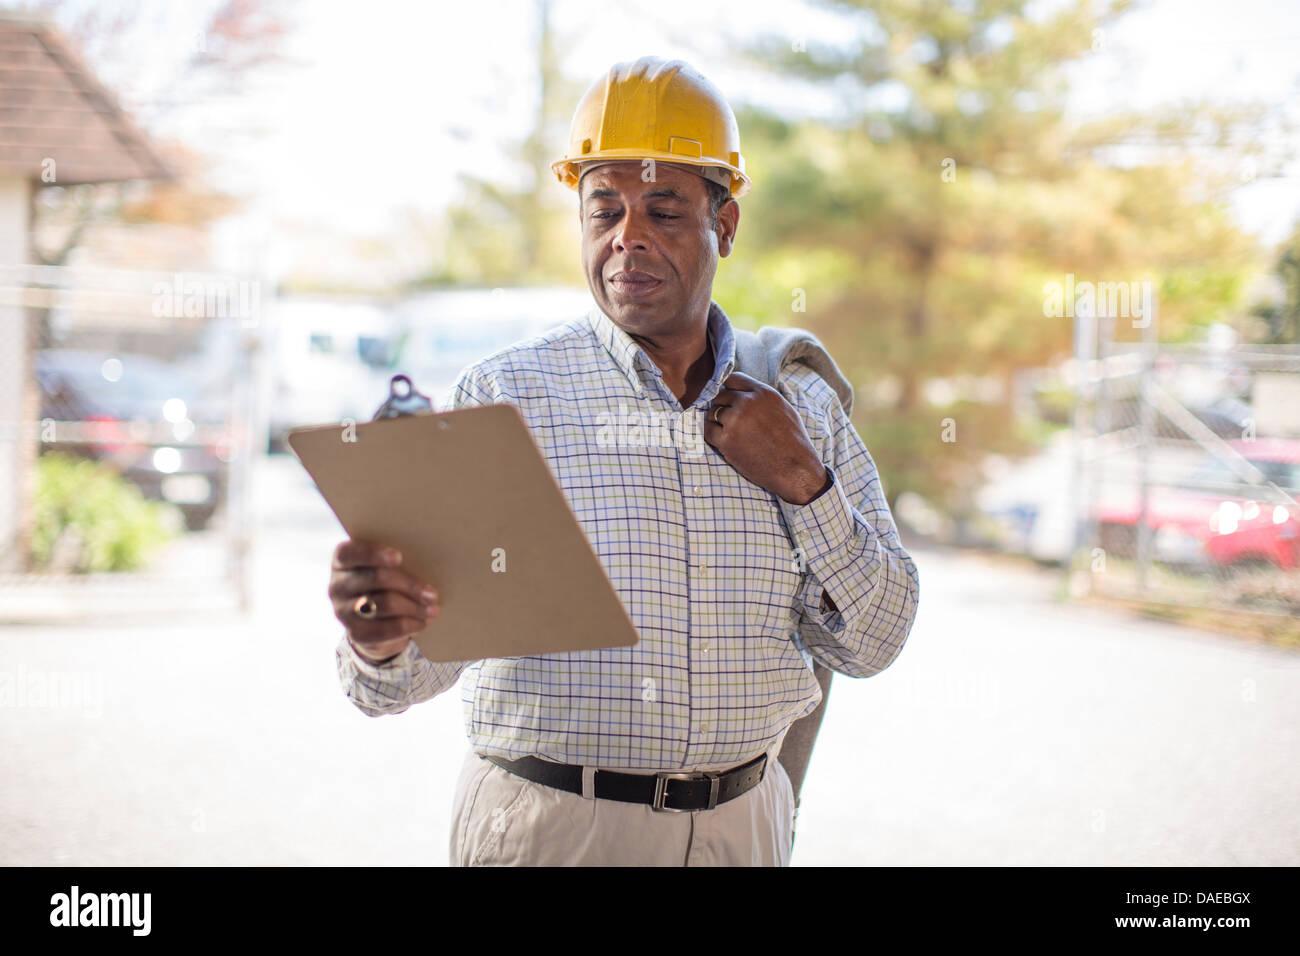 Man wearing hard hat looking at clipboard - Stock Image